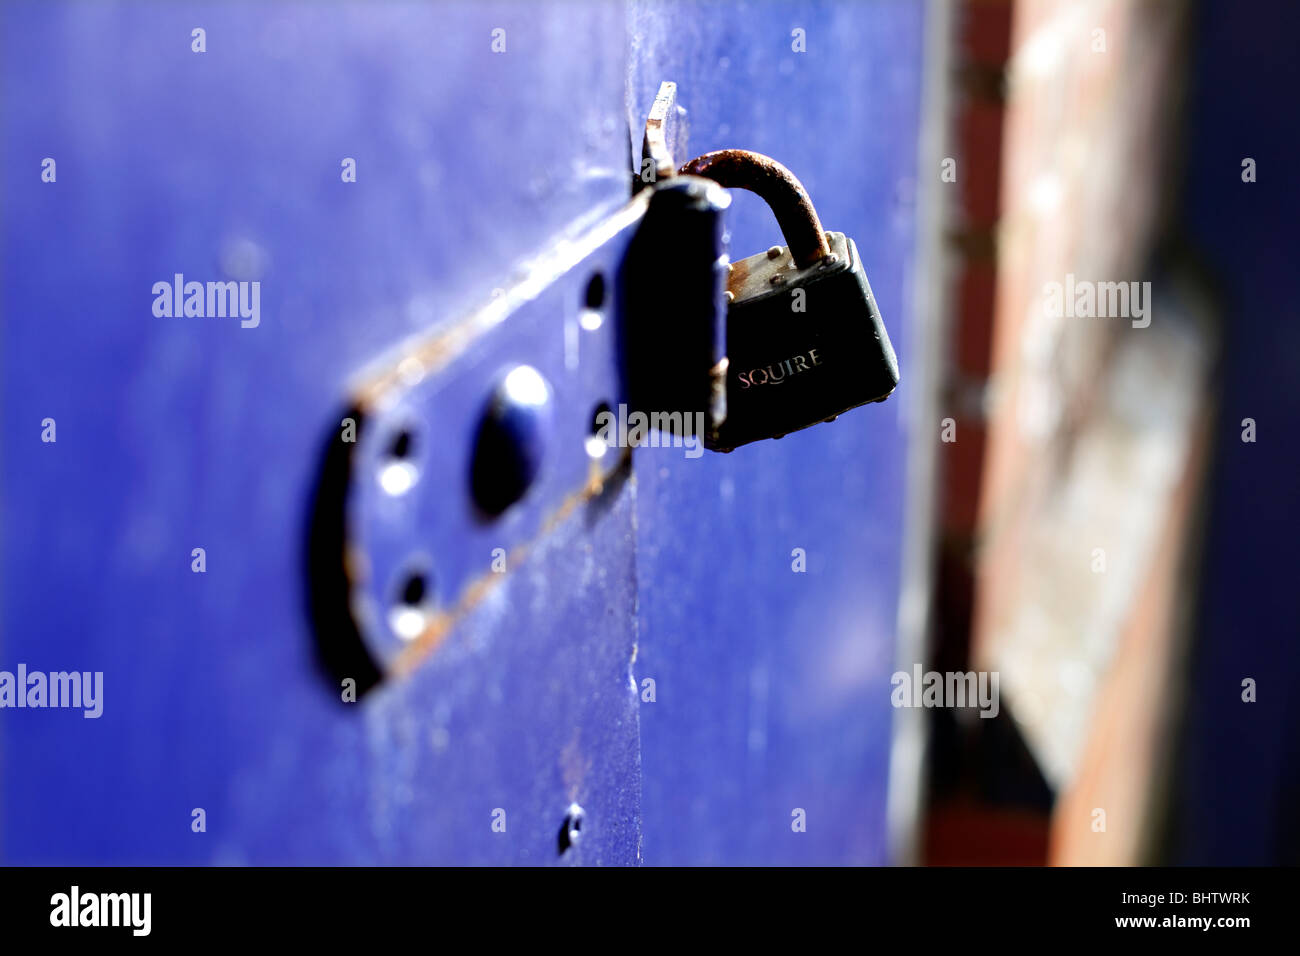 Padlocked blue doors - Stock Image